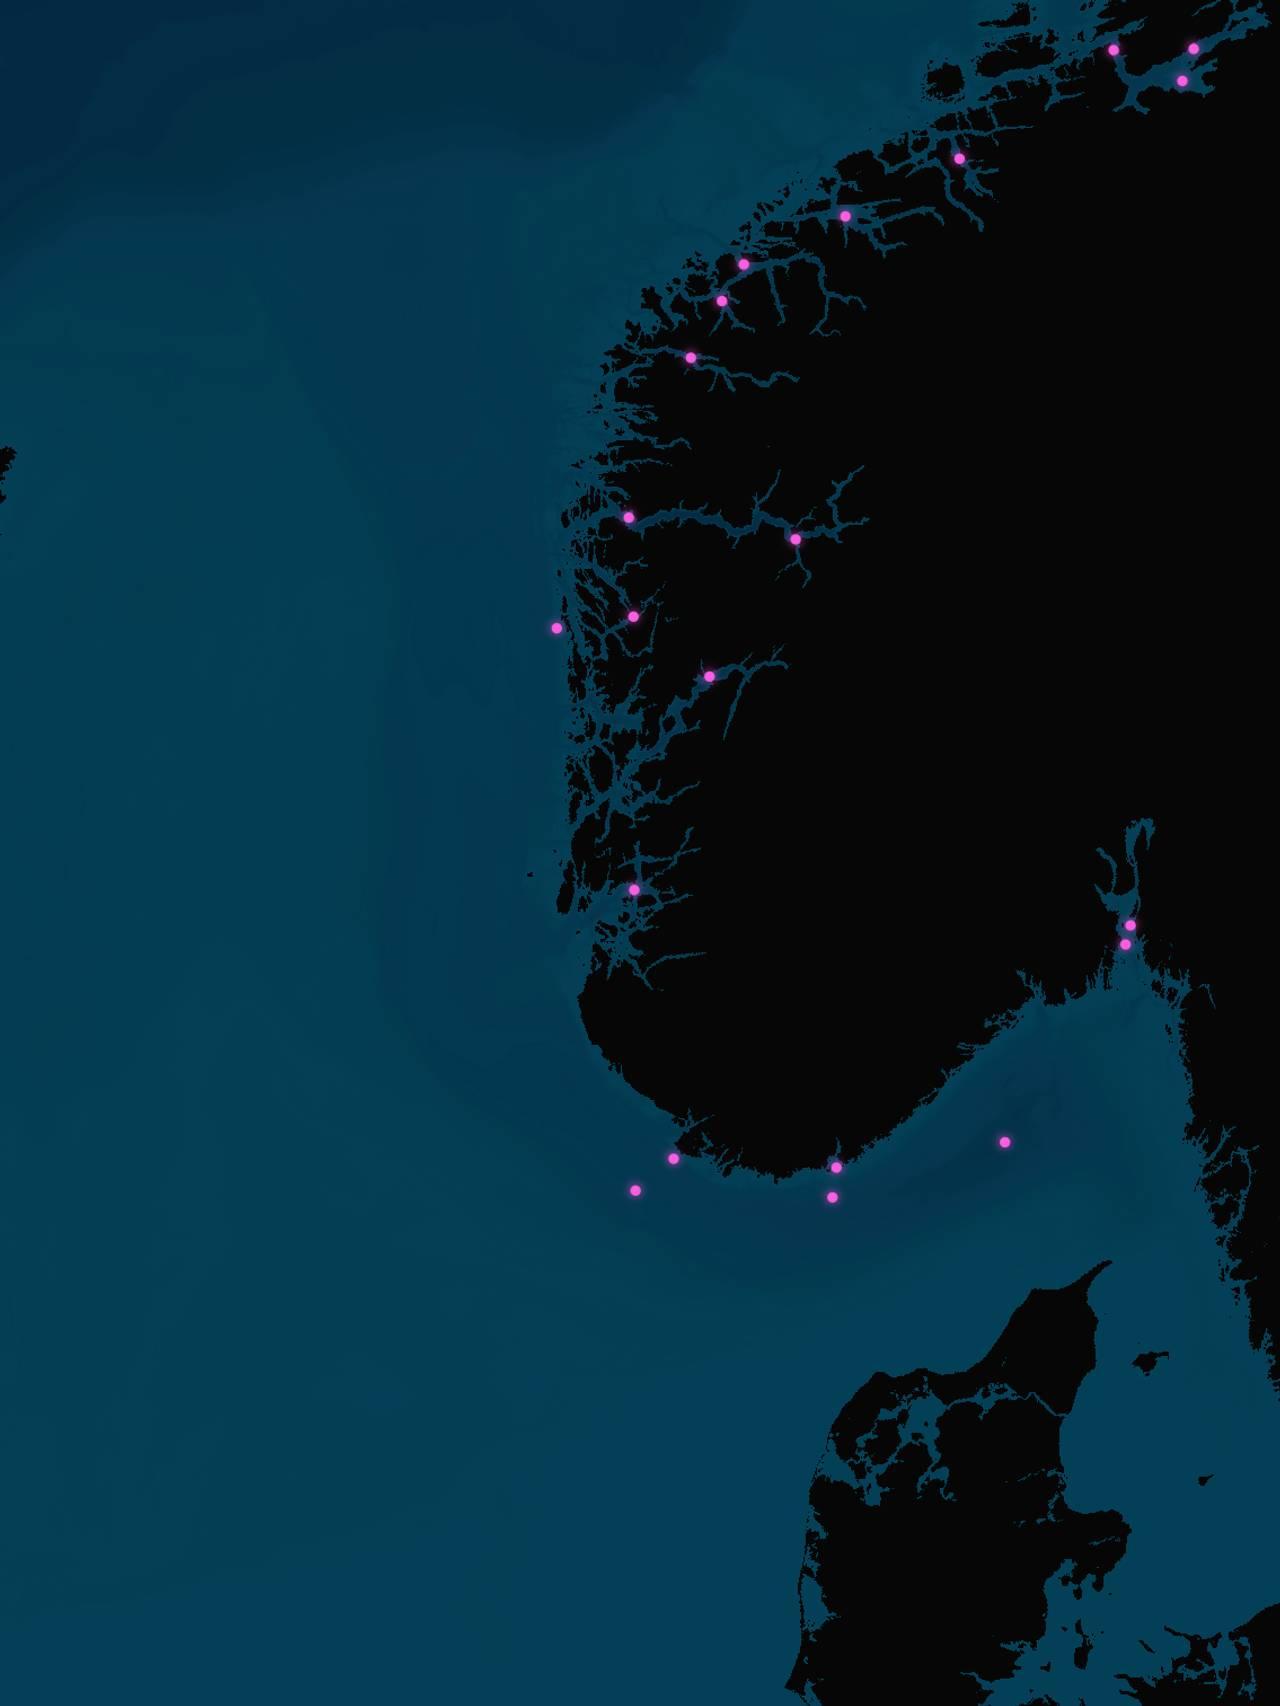 Kartet viser dumpfelt i Nordsjøen.